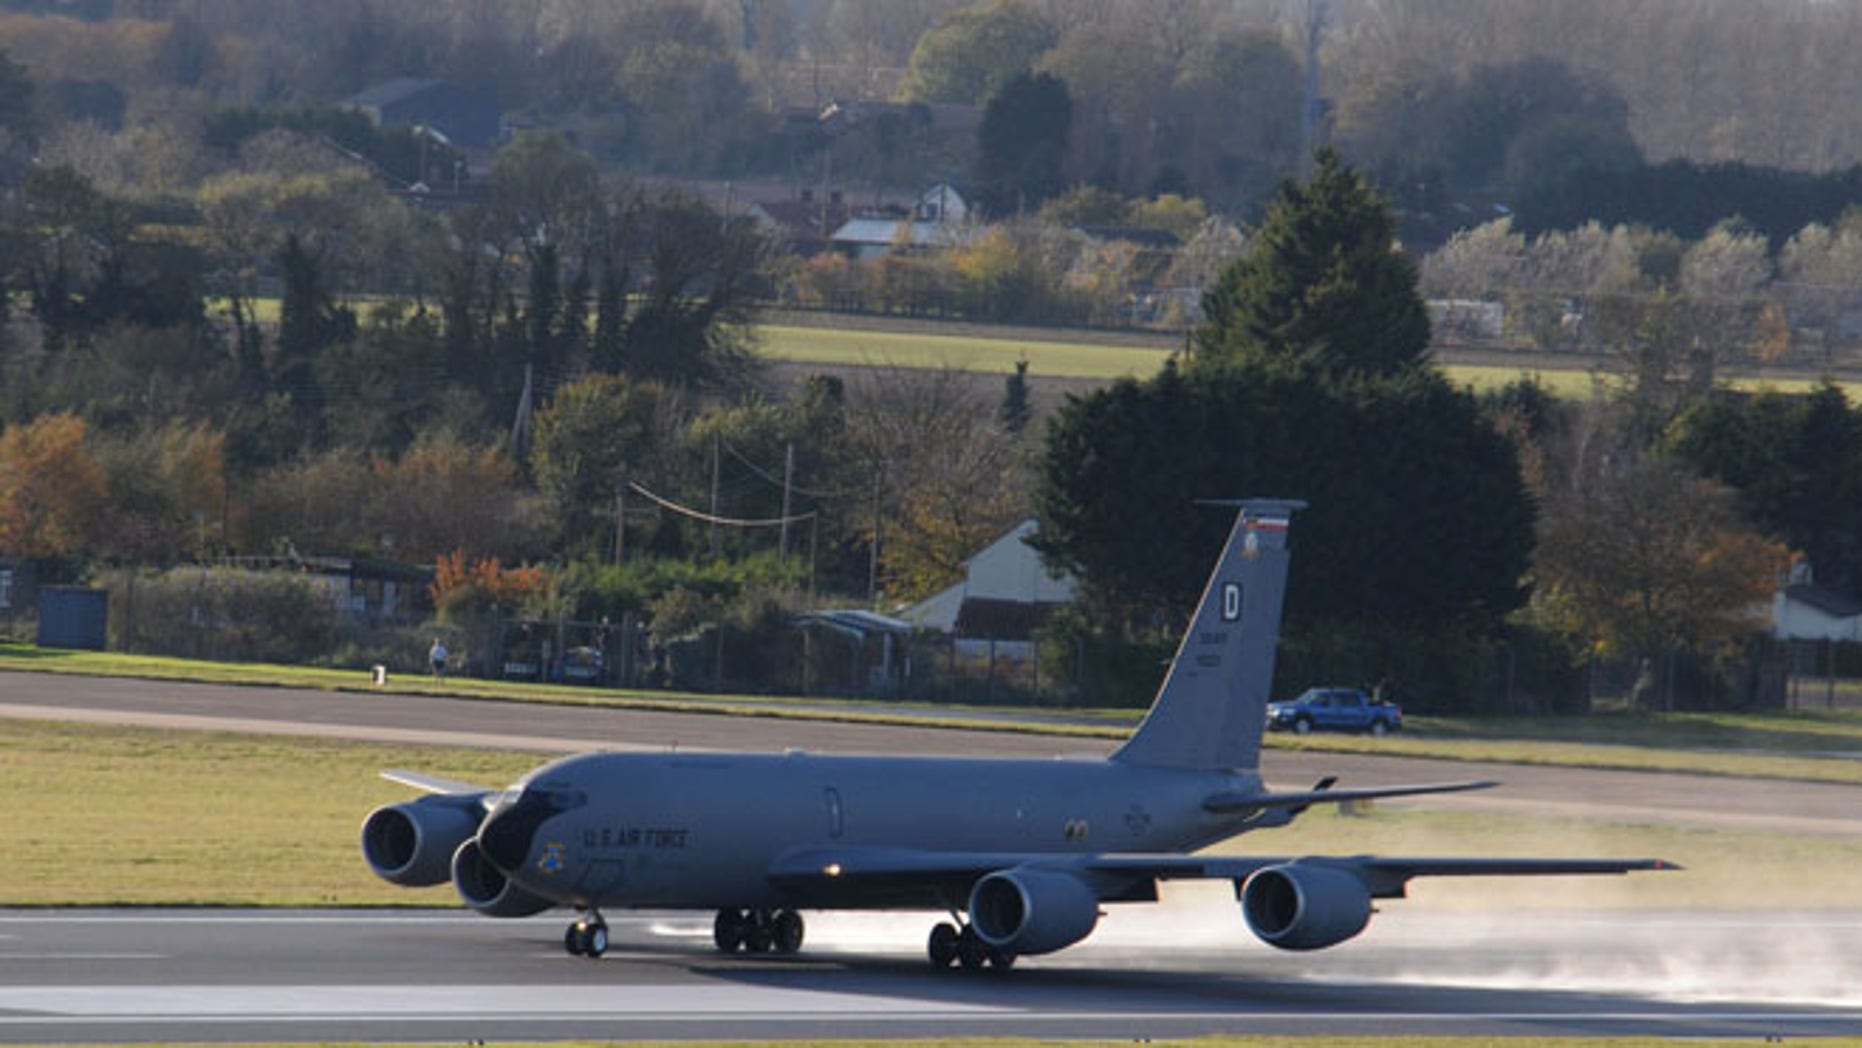 A KC-135 Stratotanker takes off Nov. 12, 2014 at RAF Mildenhall, England.